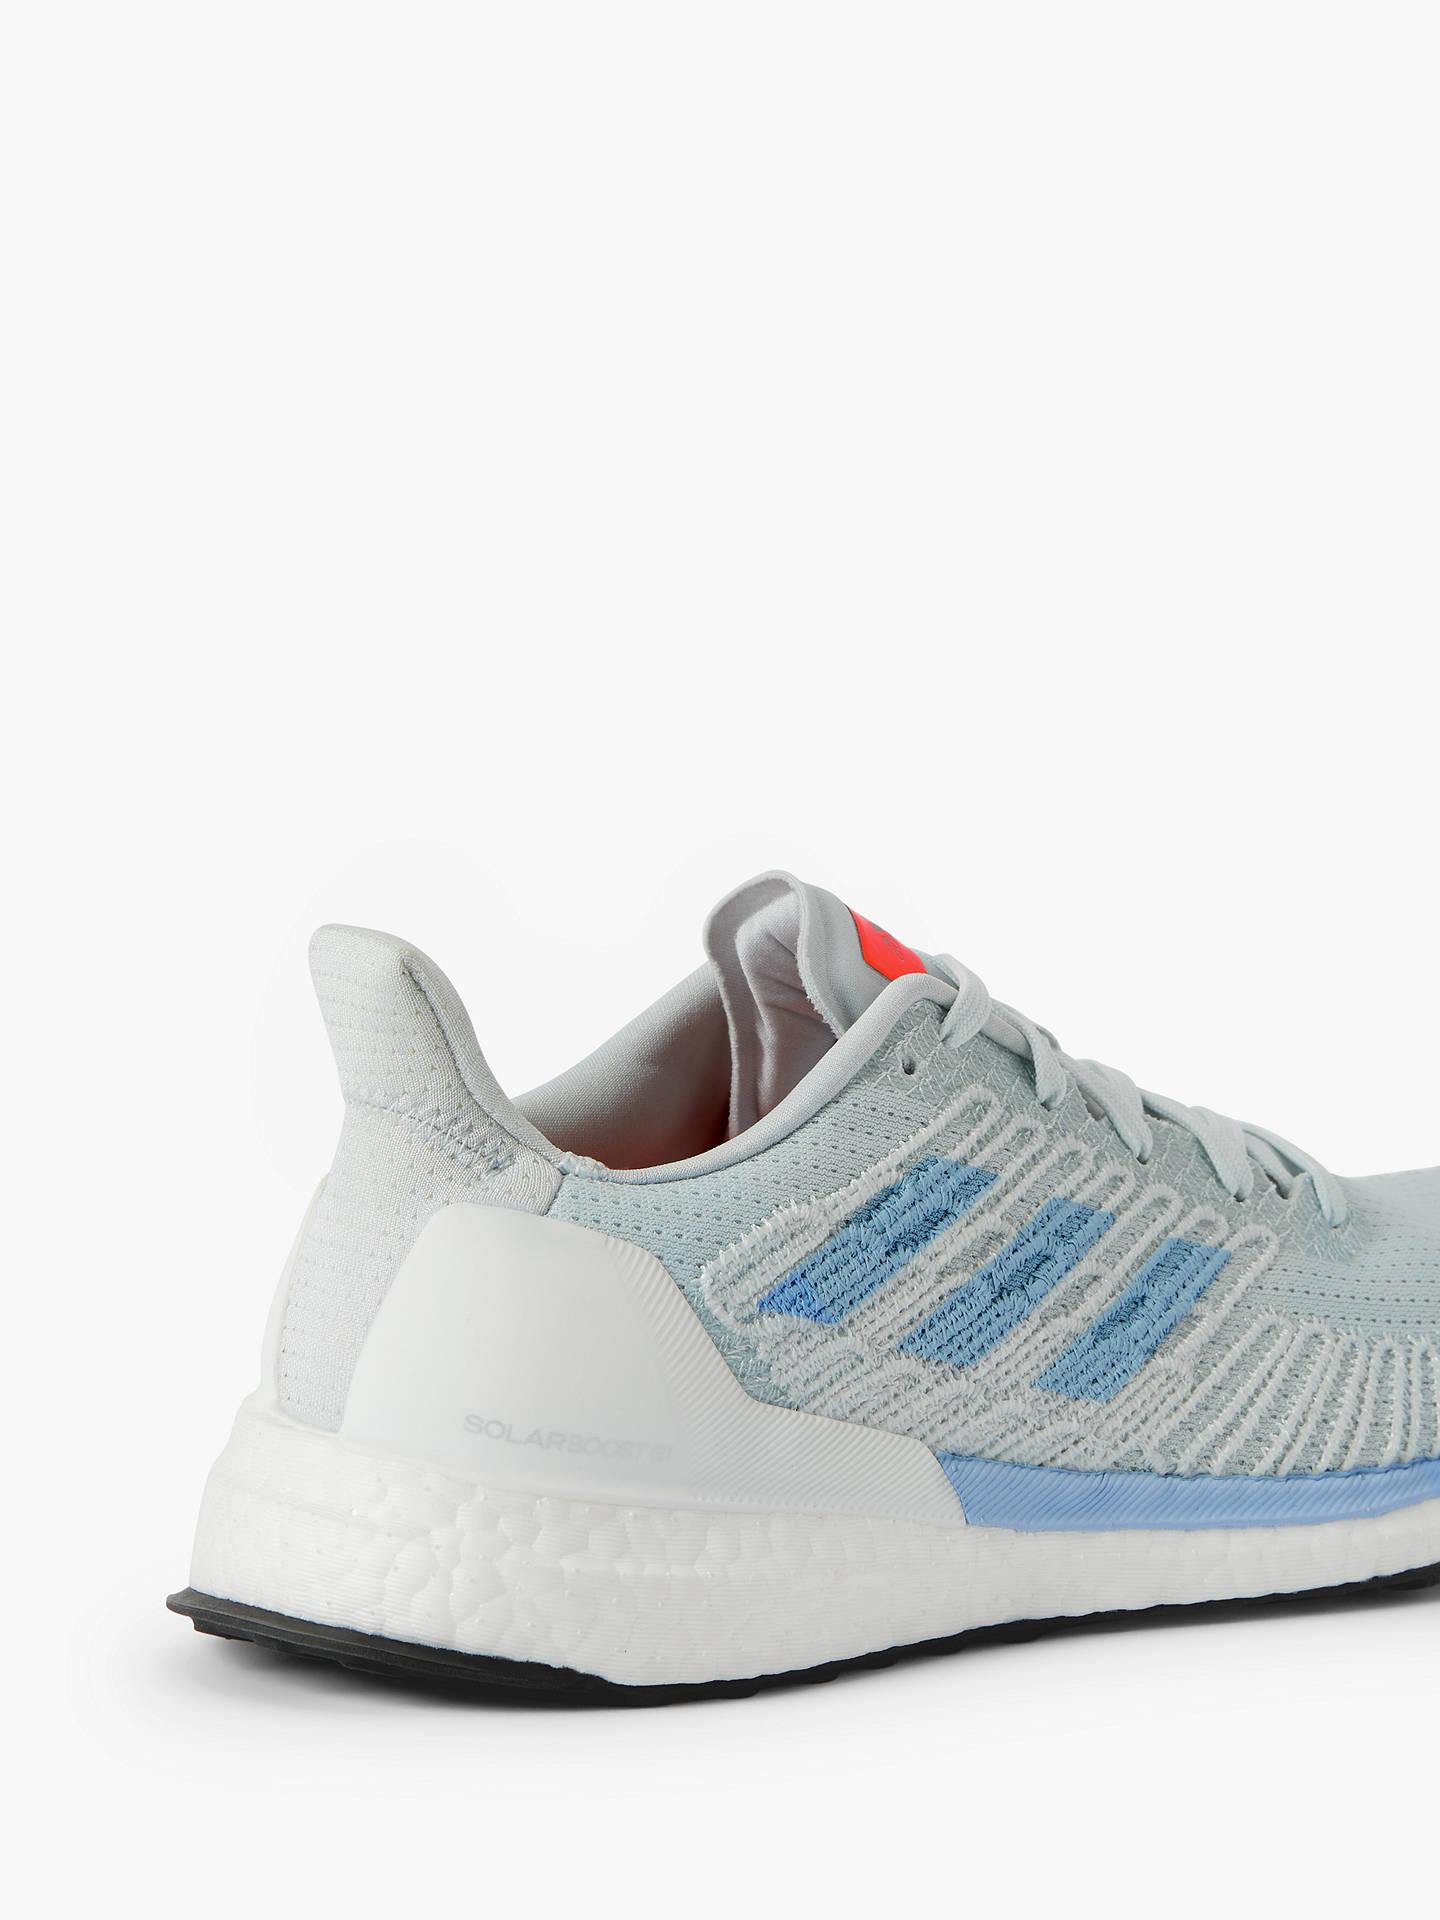 adidas Solar Boost 19 ST Women's Running Shoes, Blue TintGlow BlueSolar Orange